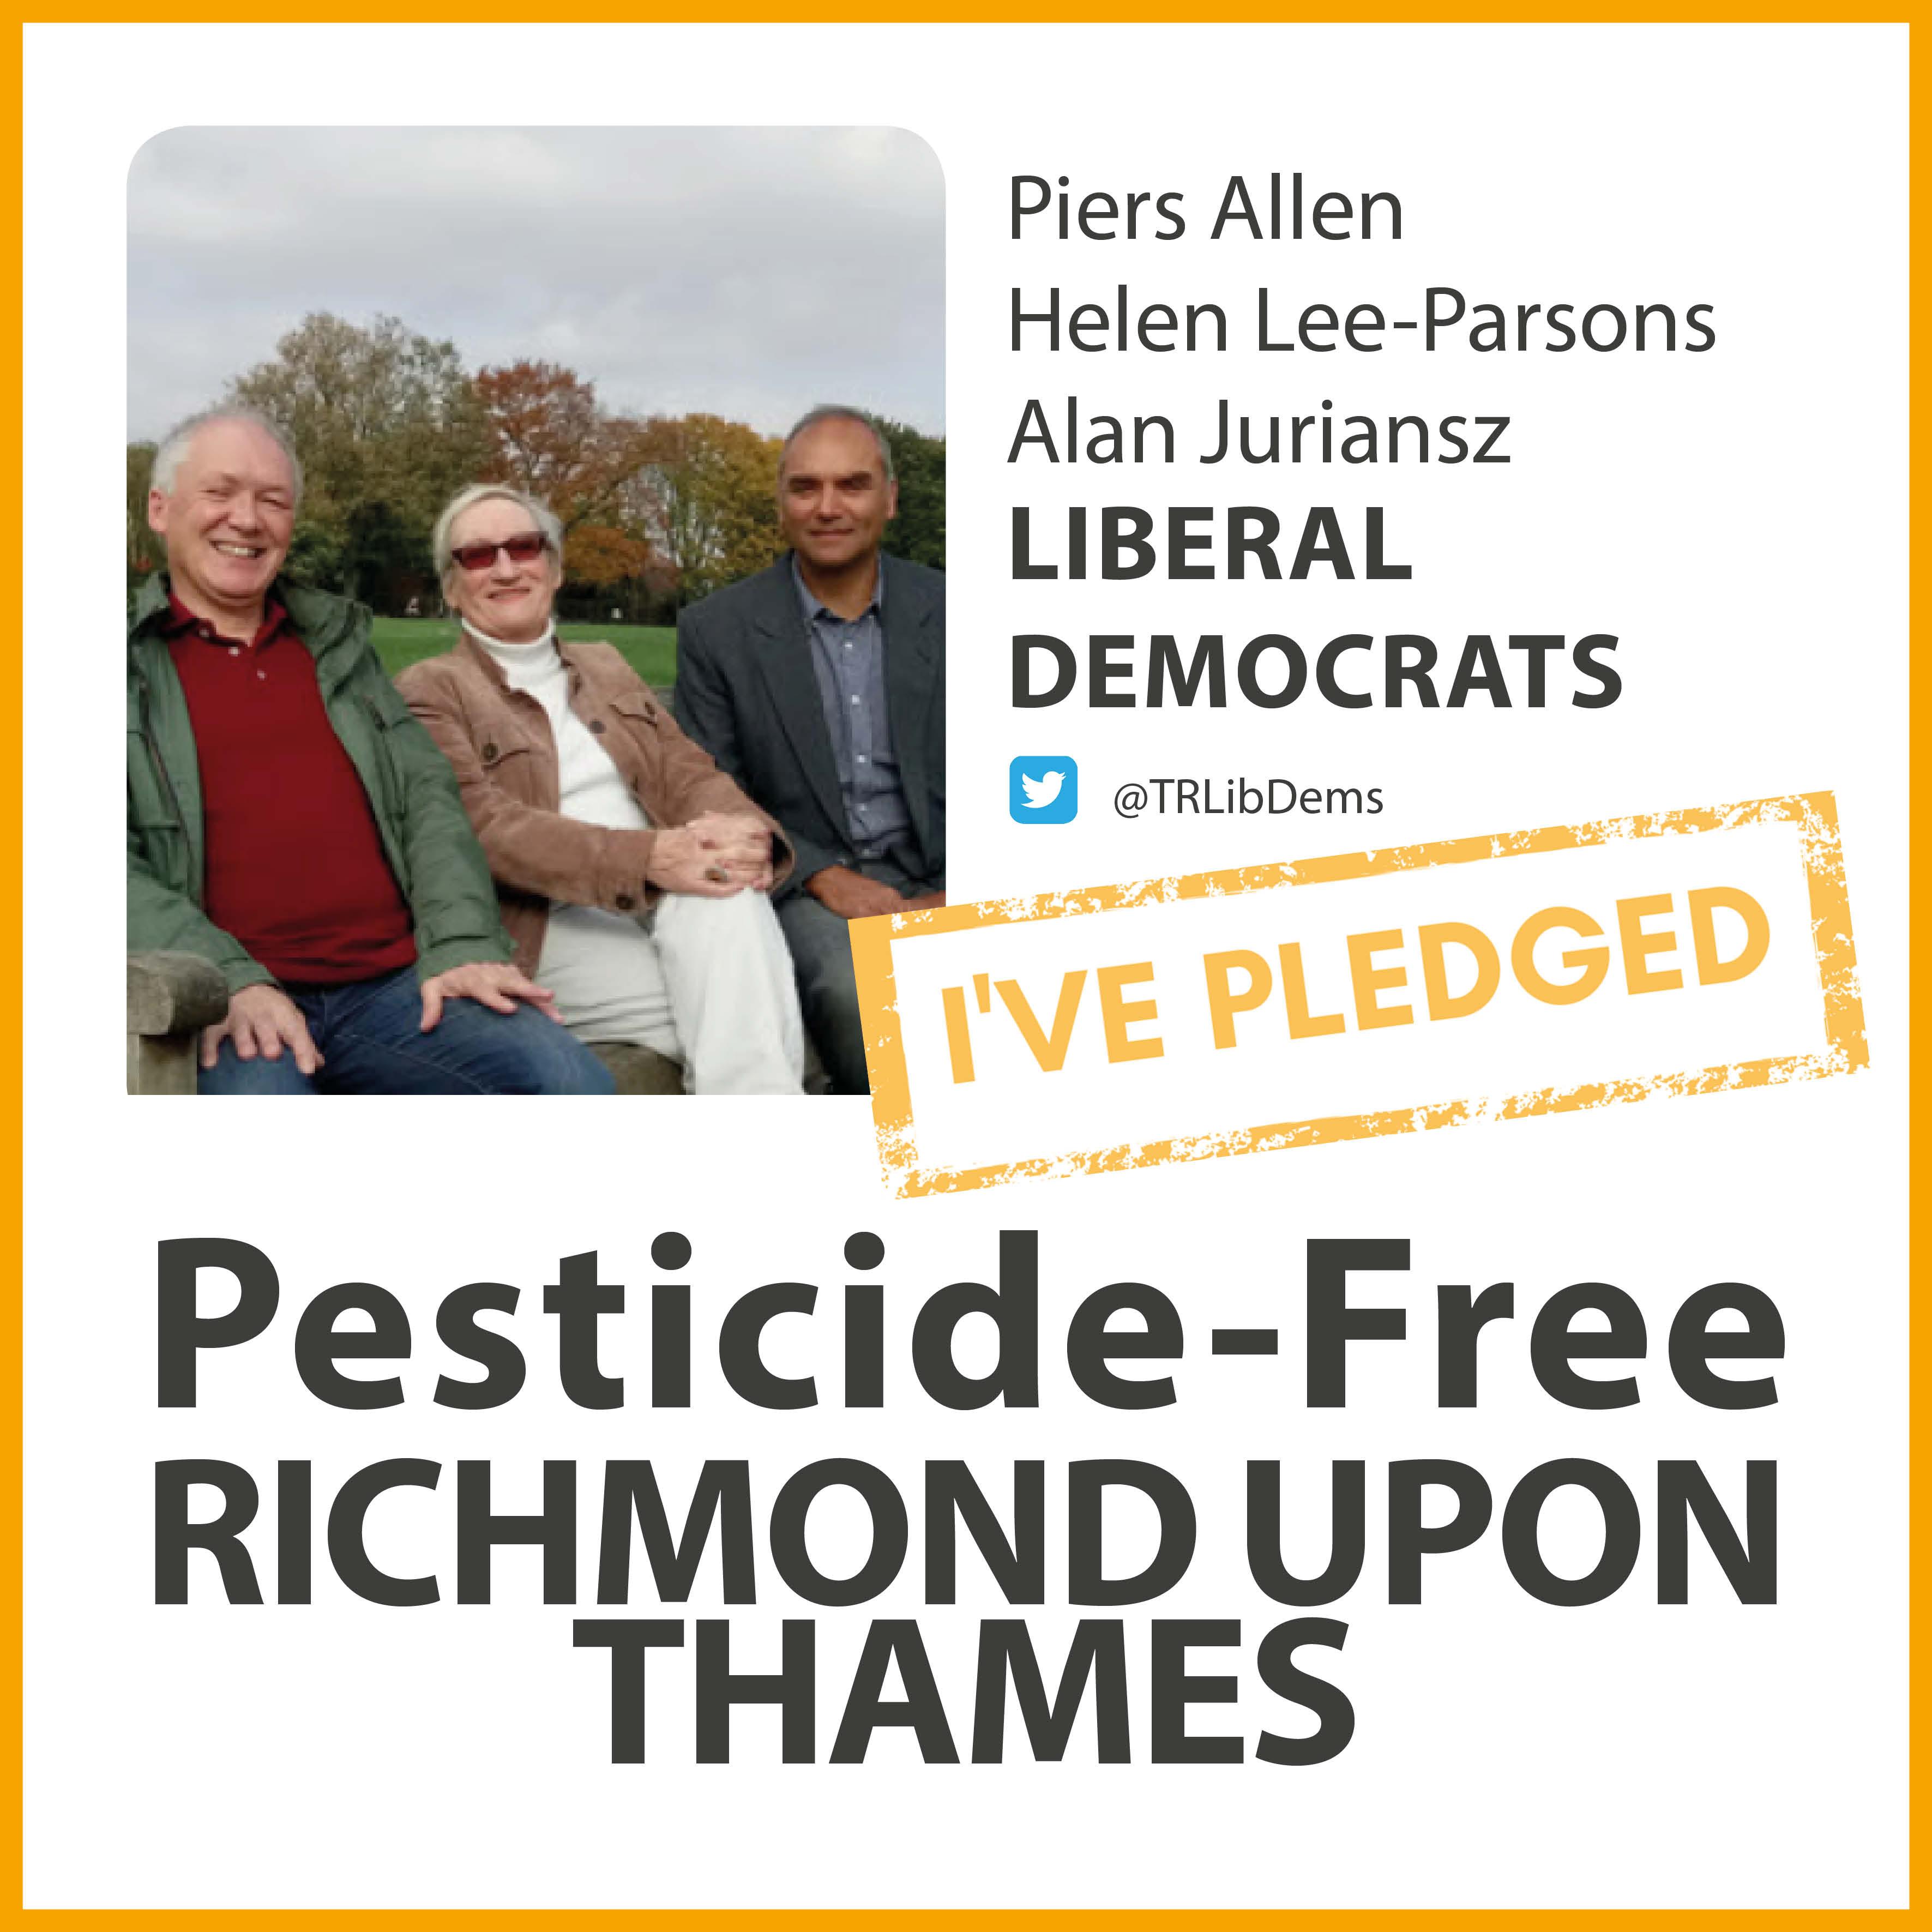 West Twickenham Lib Dems have taken the pesticide-free pledge